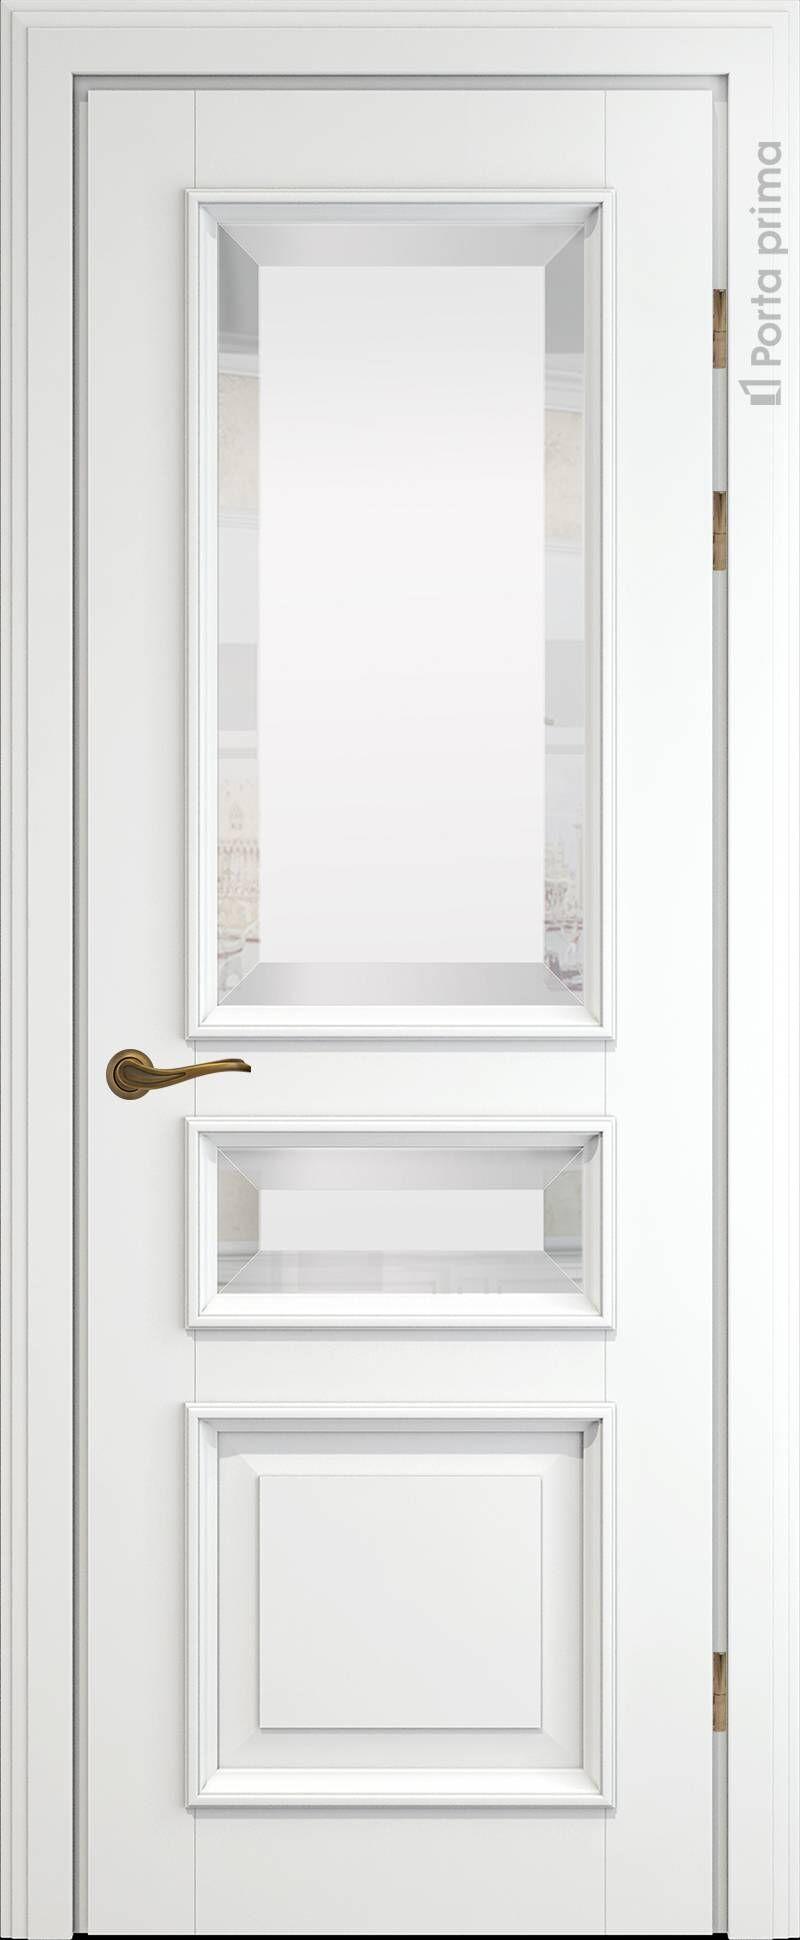 Imperia-R LUX цвет - Белая эмаль (RAL 9003) Со стеклом (ДО)